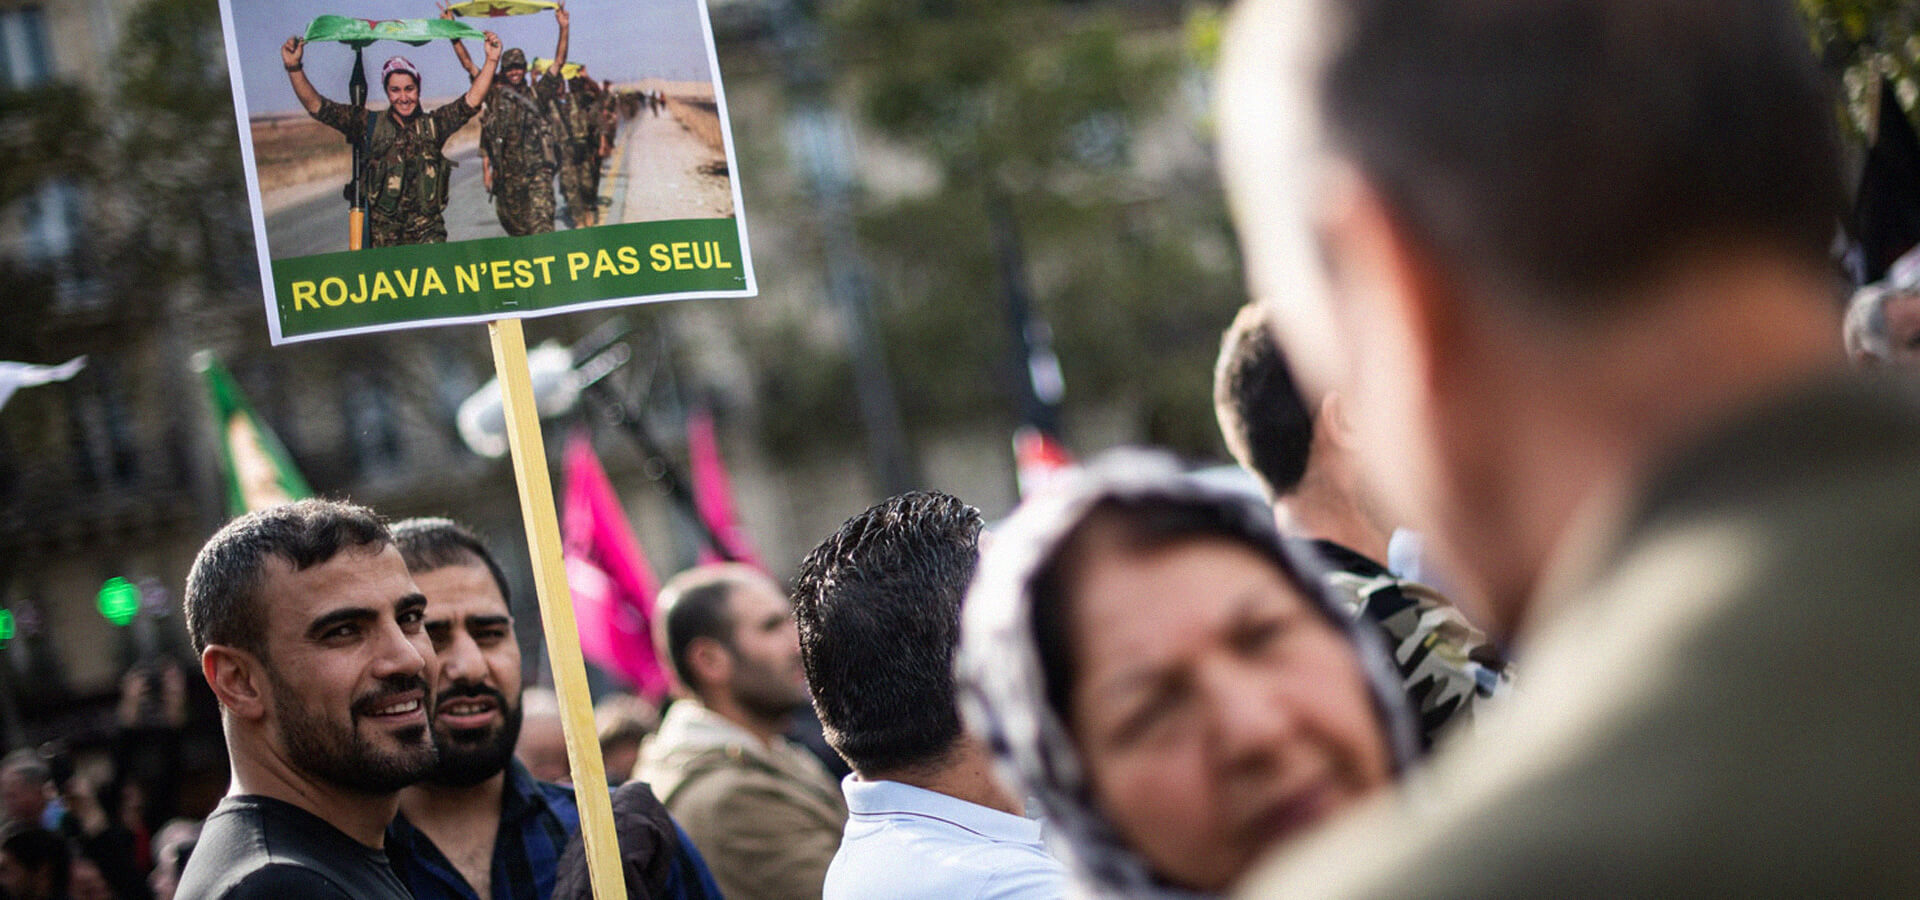 Rojava : « La révolution ne doit pas disparaître »